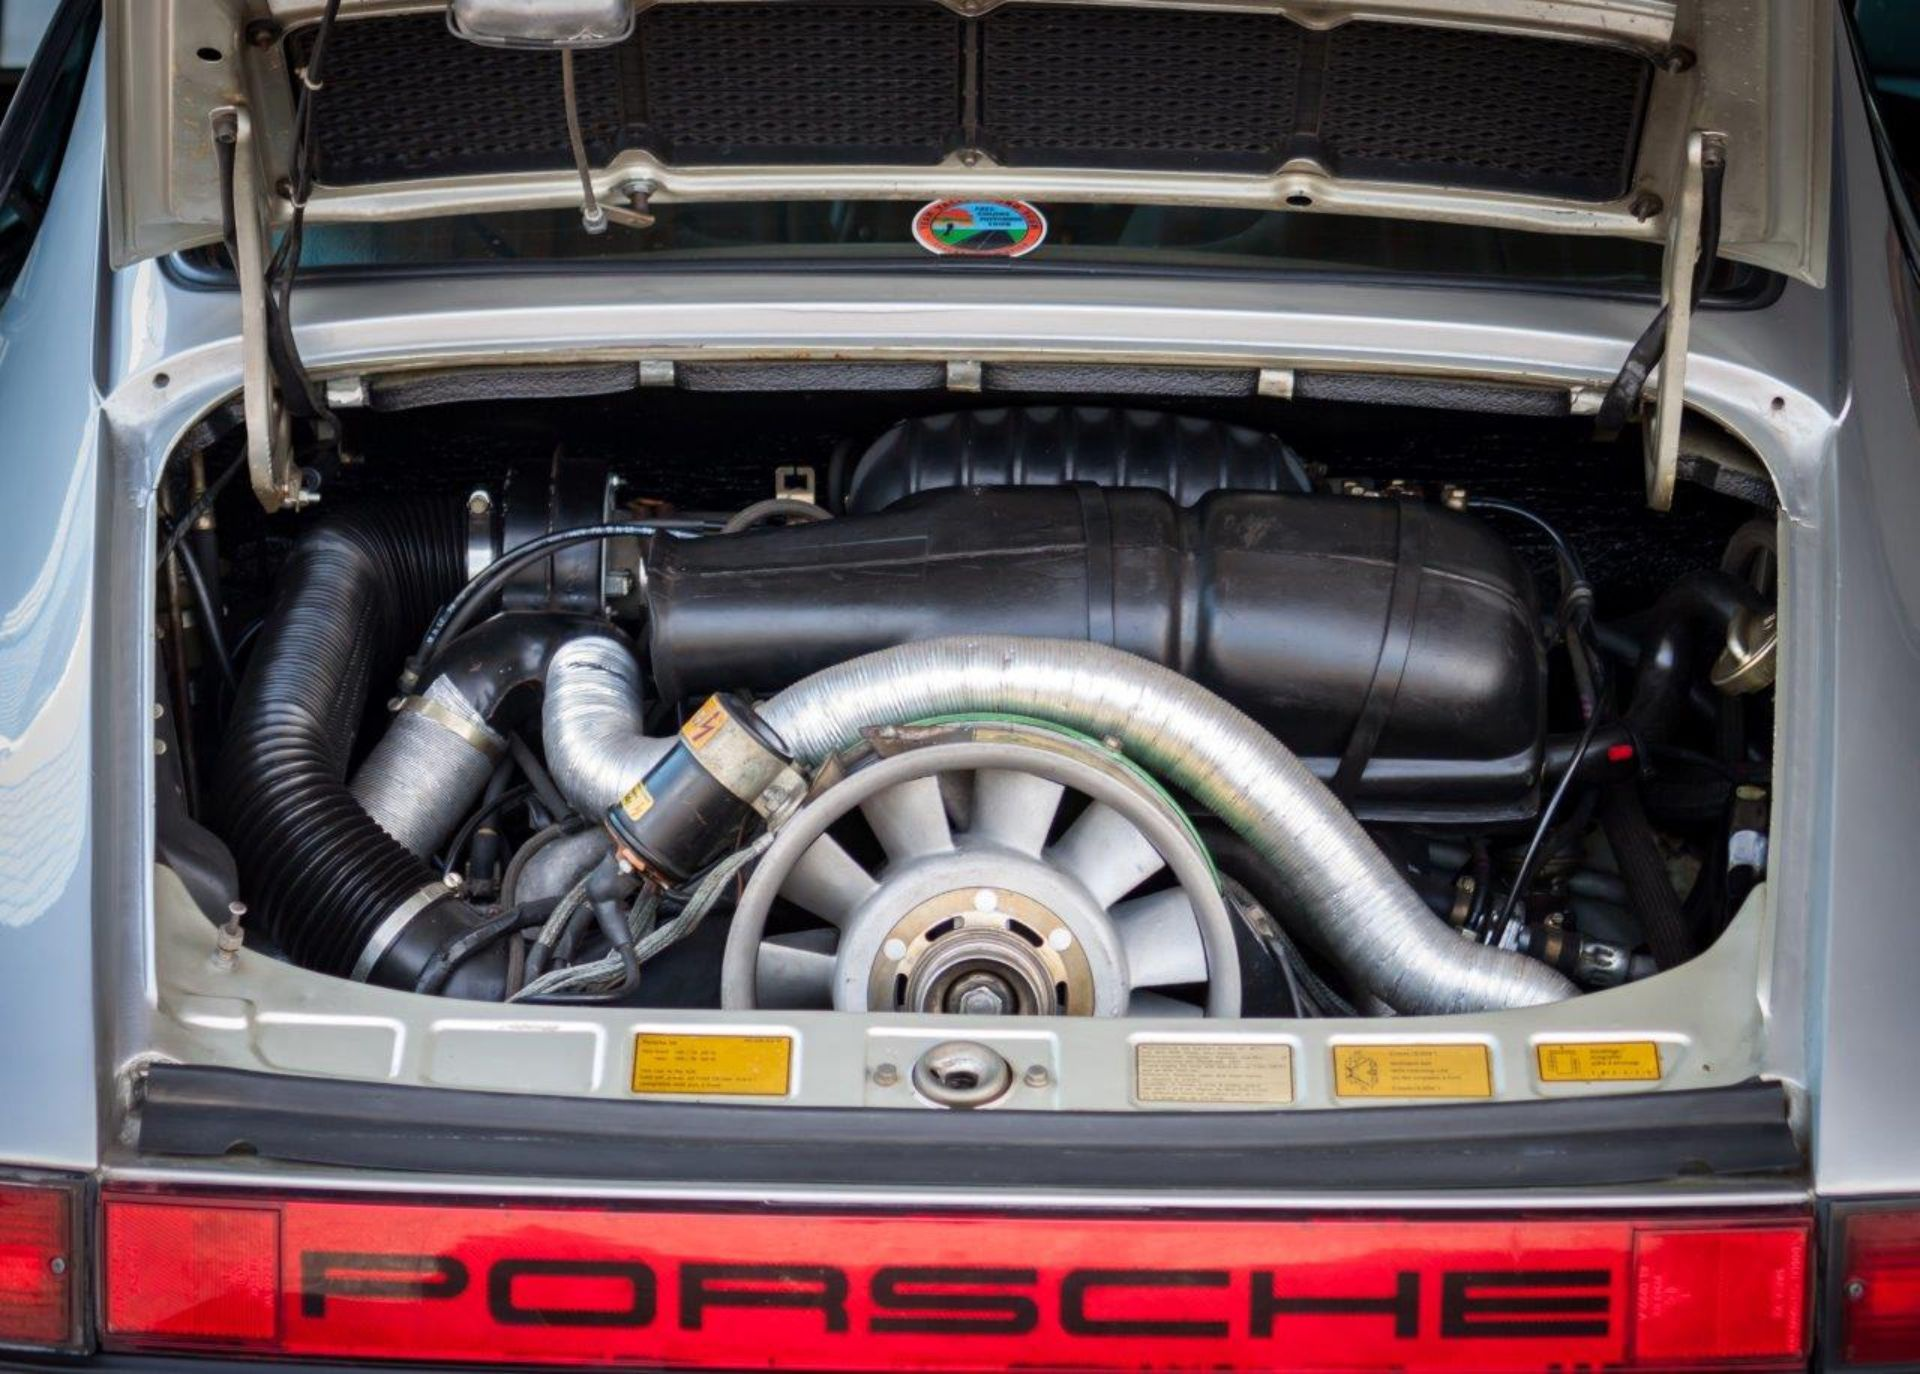 1977 Porsche 911 S | PCARMARKET